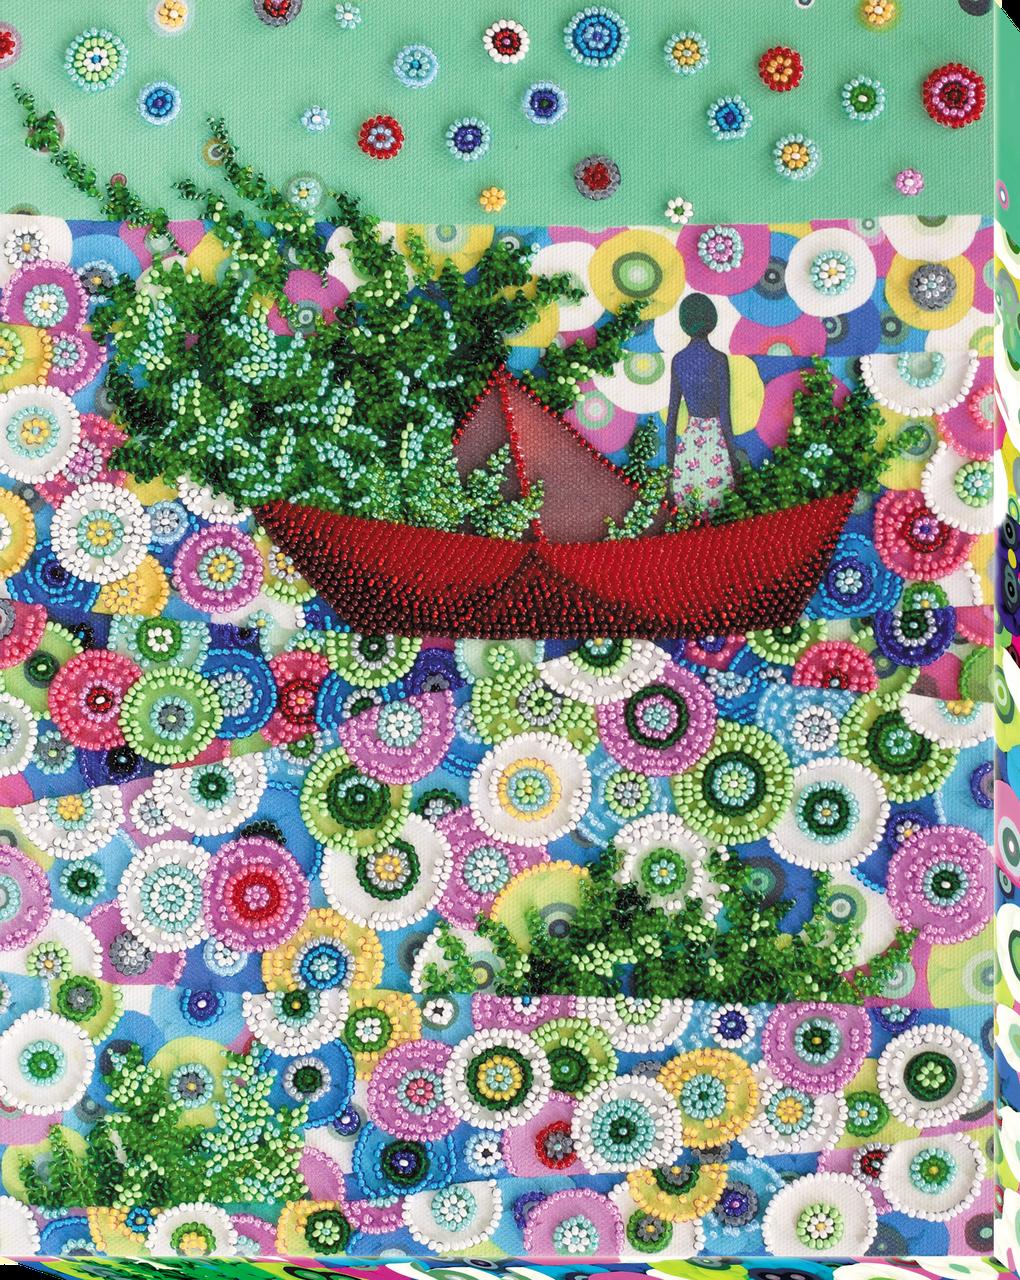 Наборы для вышивки бисером Весна идёт - весне дорогу! (25 х 31 см) Абрис Арт AB-682